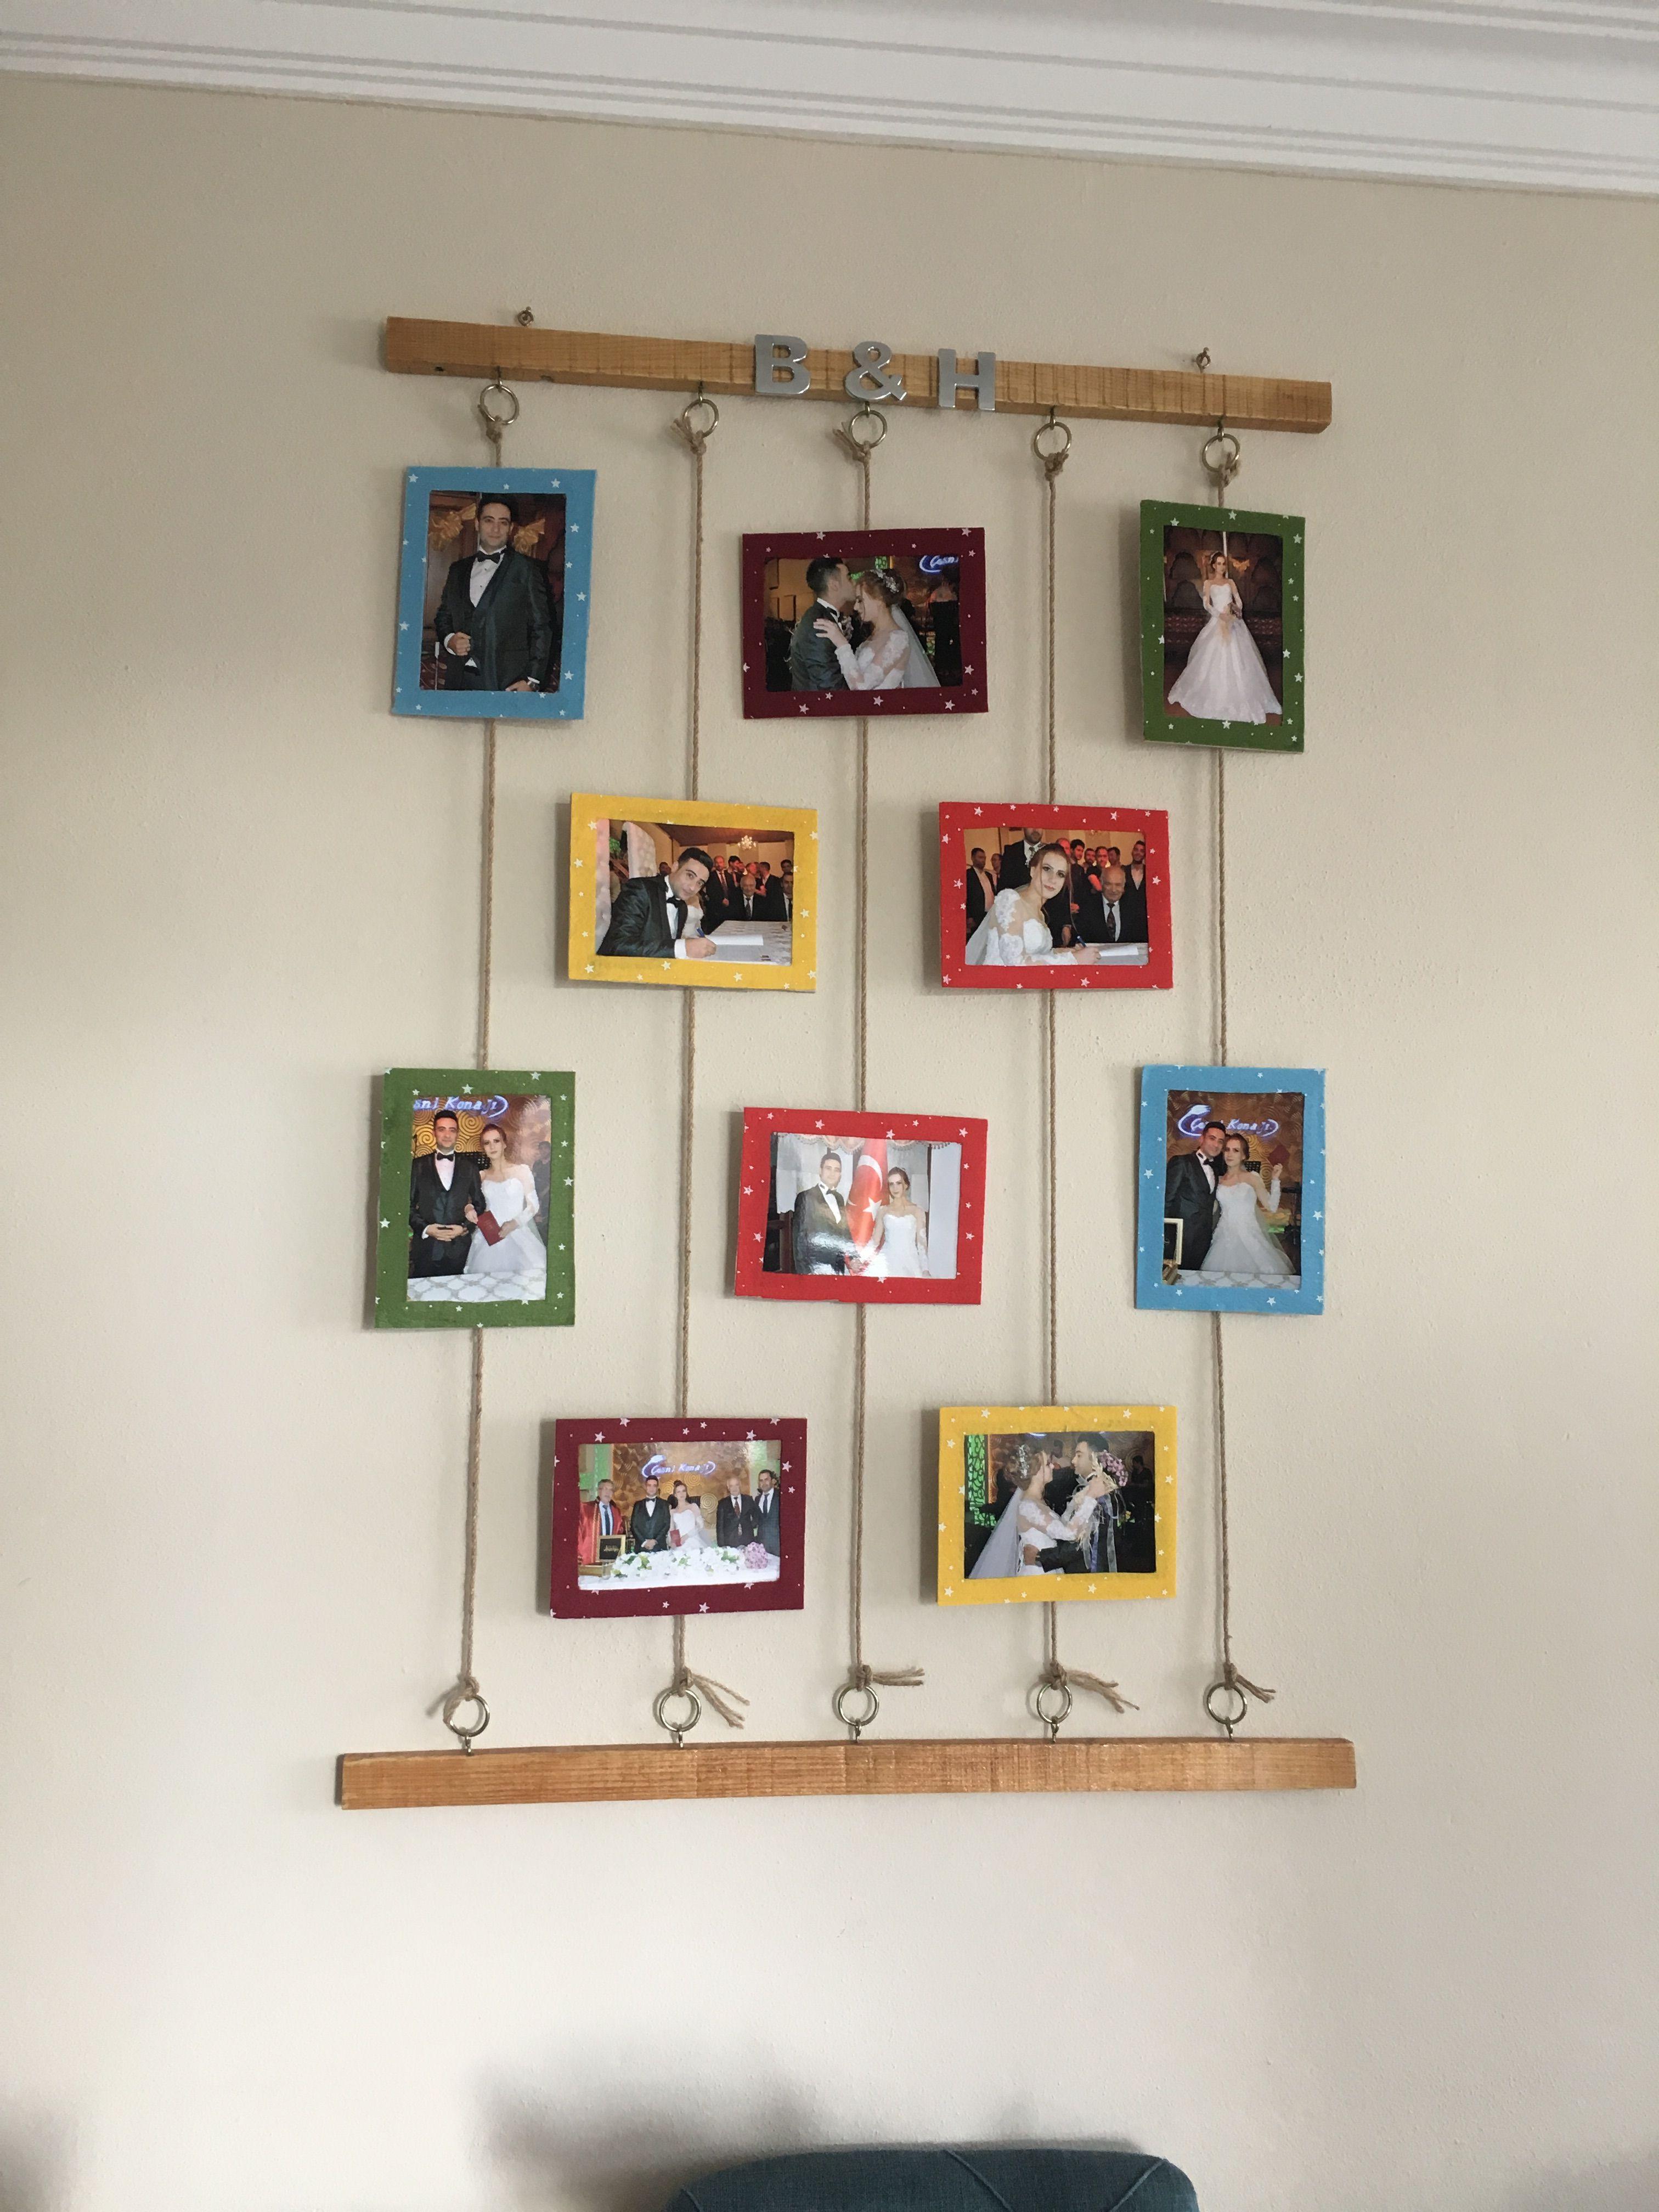 Pin By Sapna Gupta On New House Ideas Frame Wall Decor Diy Home